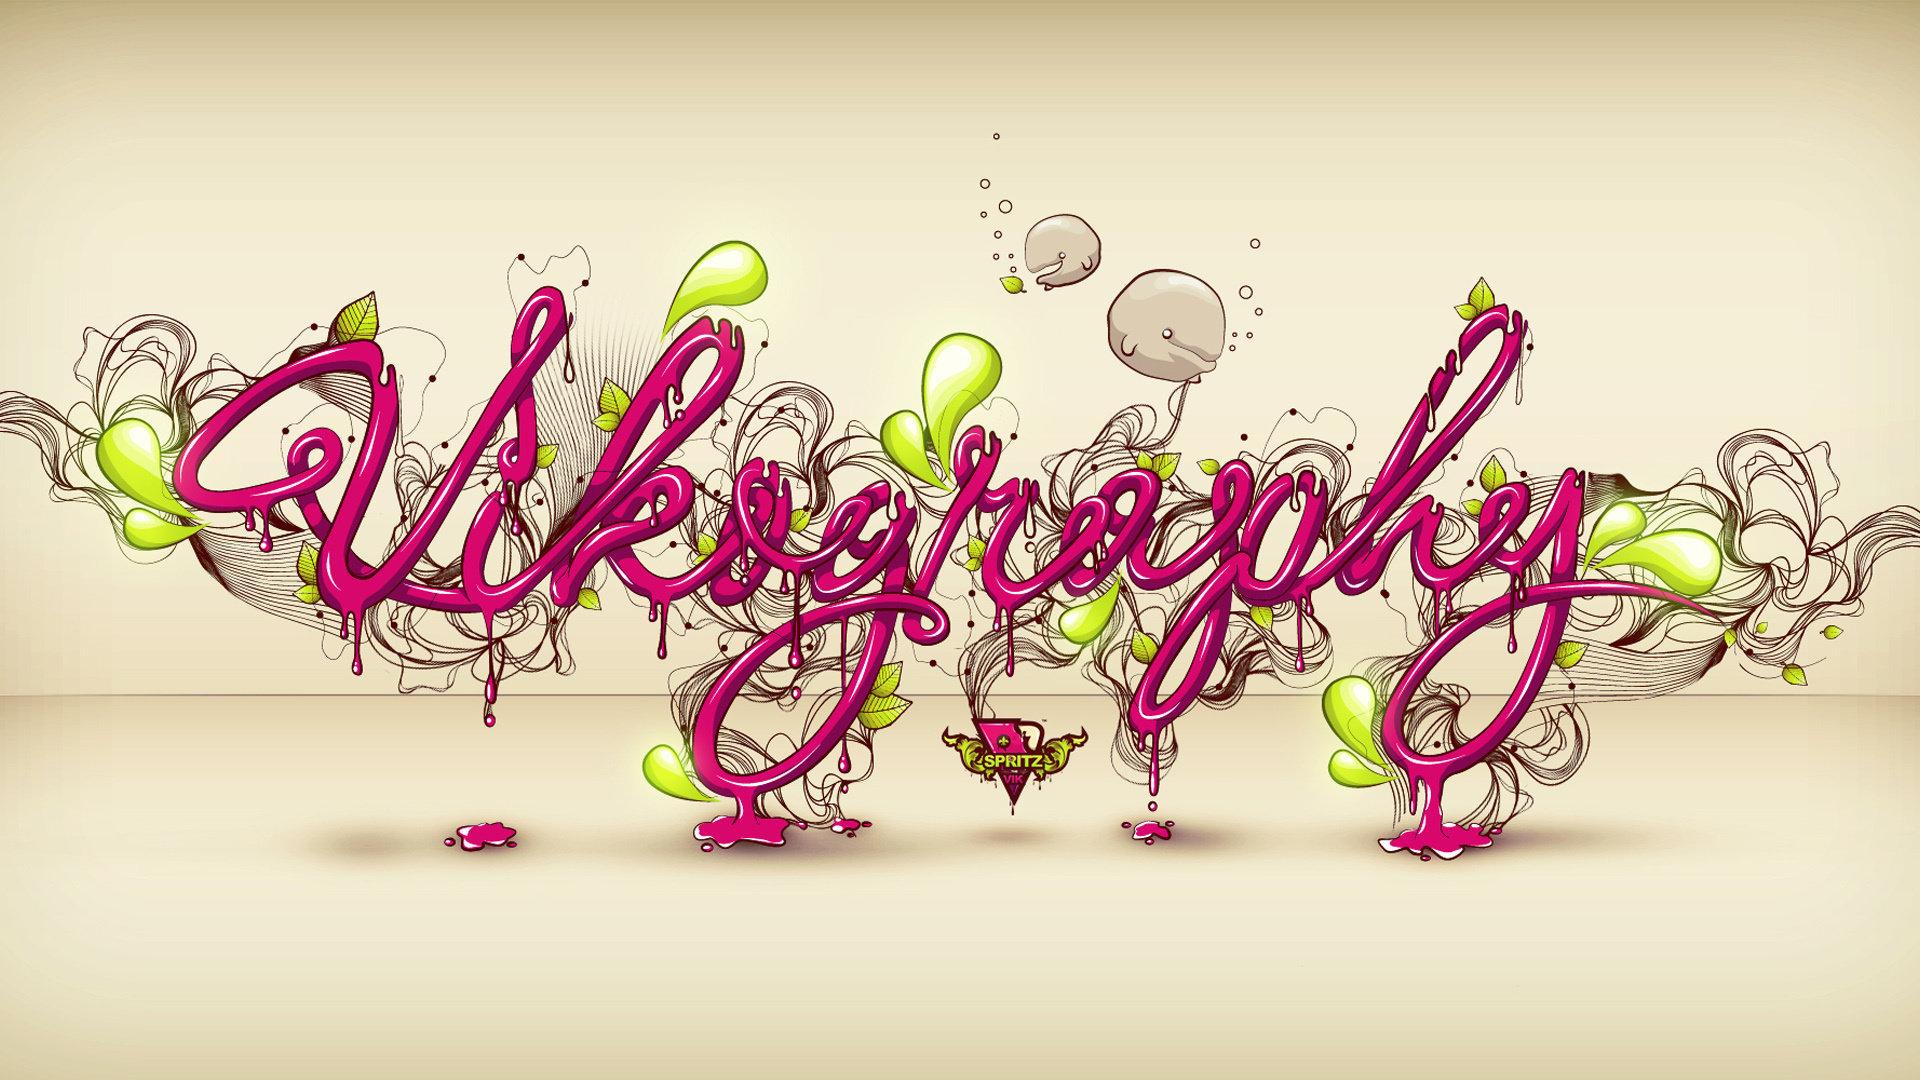 Typography wallpapers Full HD 1080p desktop backgrounds